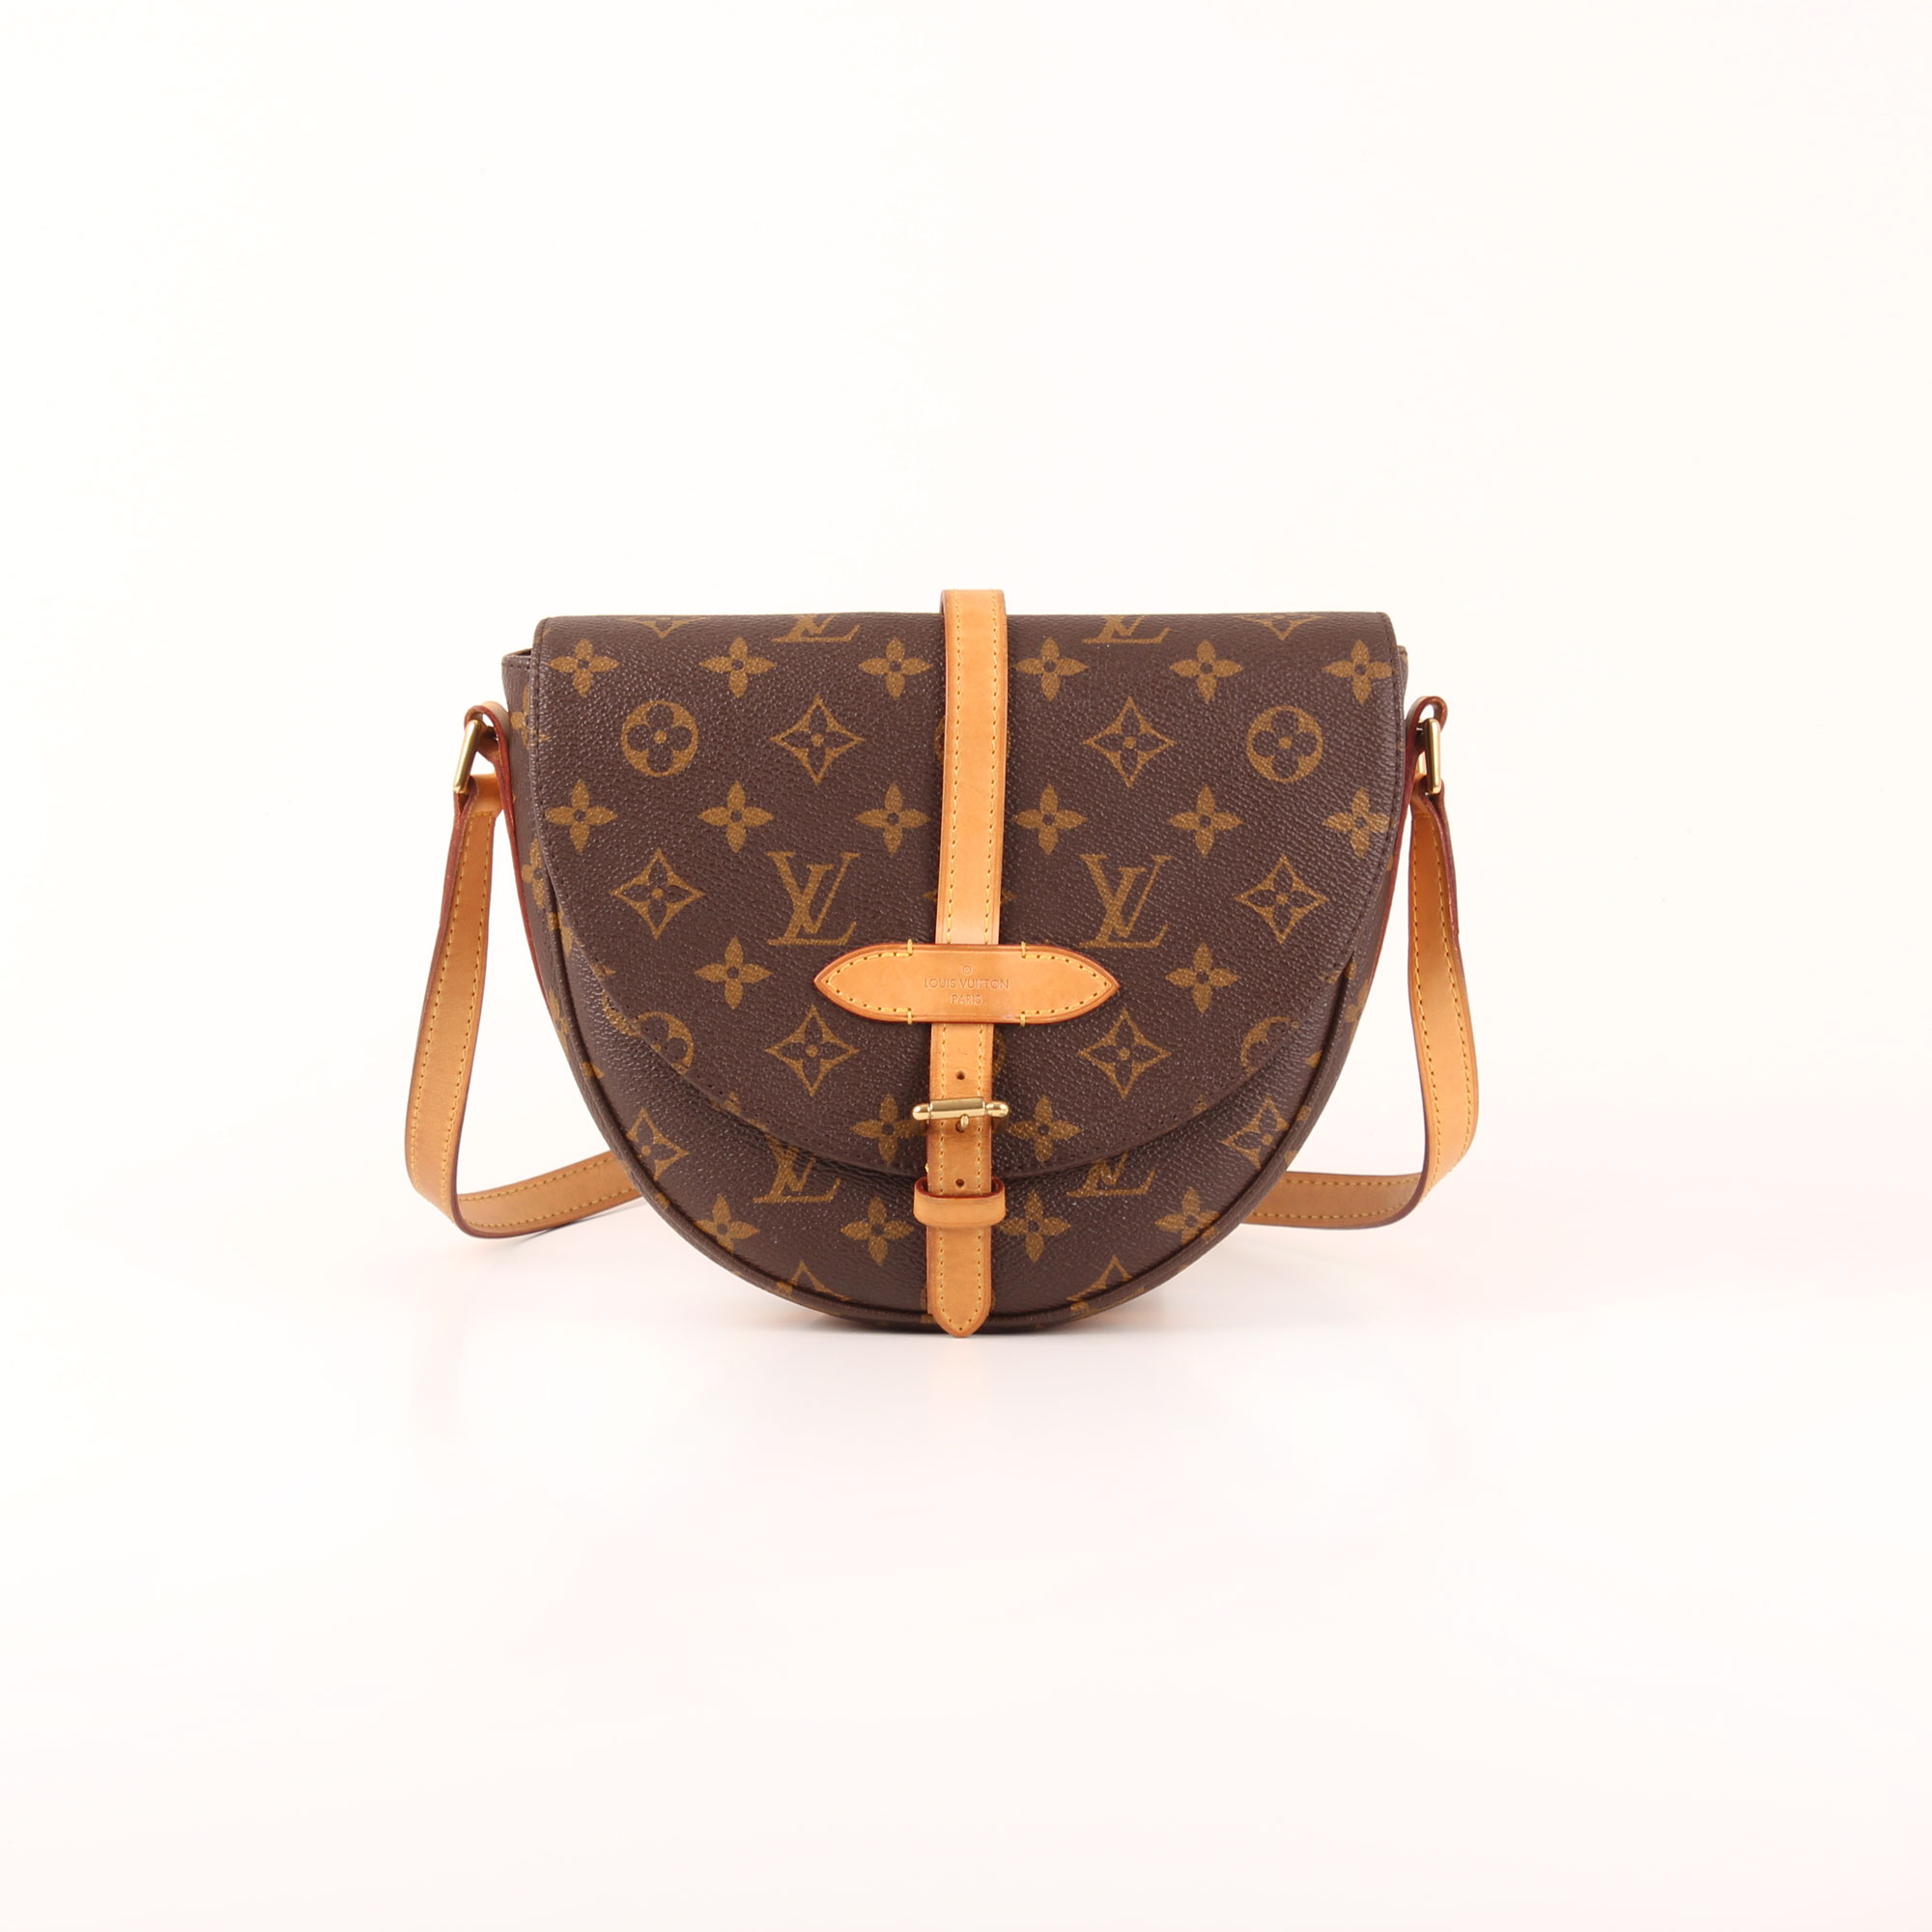 Front image of messenger bag louis vuitton chantilly monogram 5e059c279a007